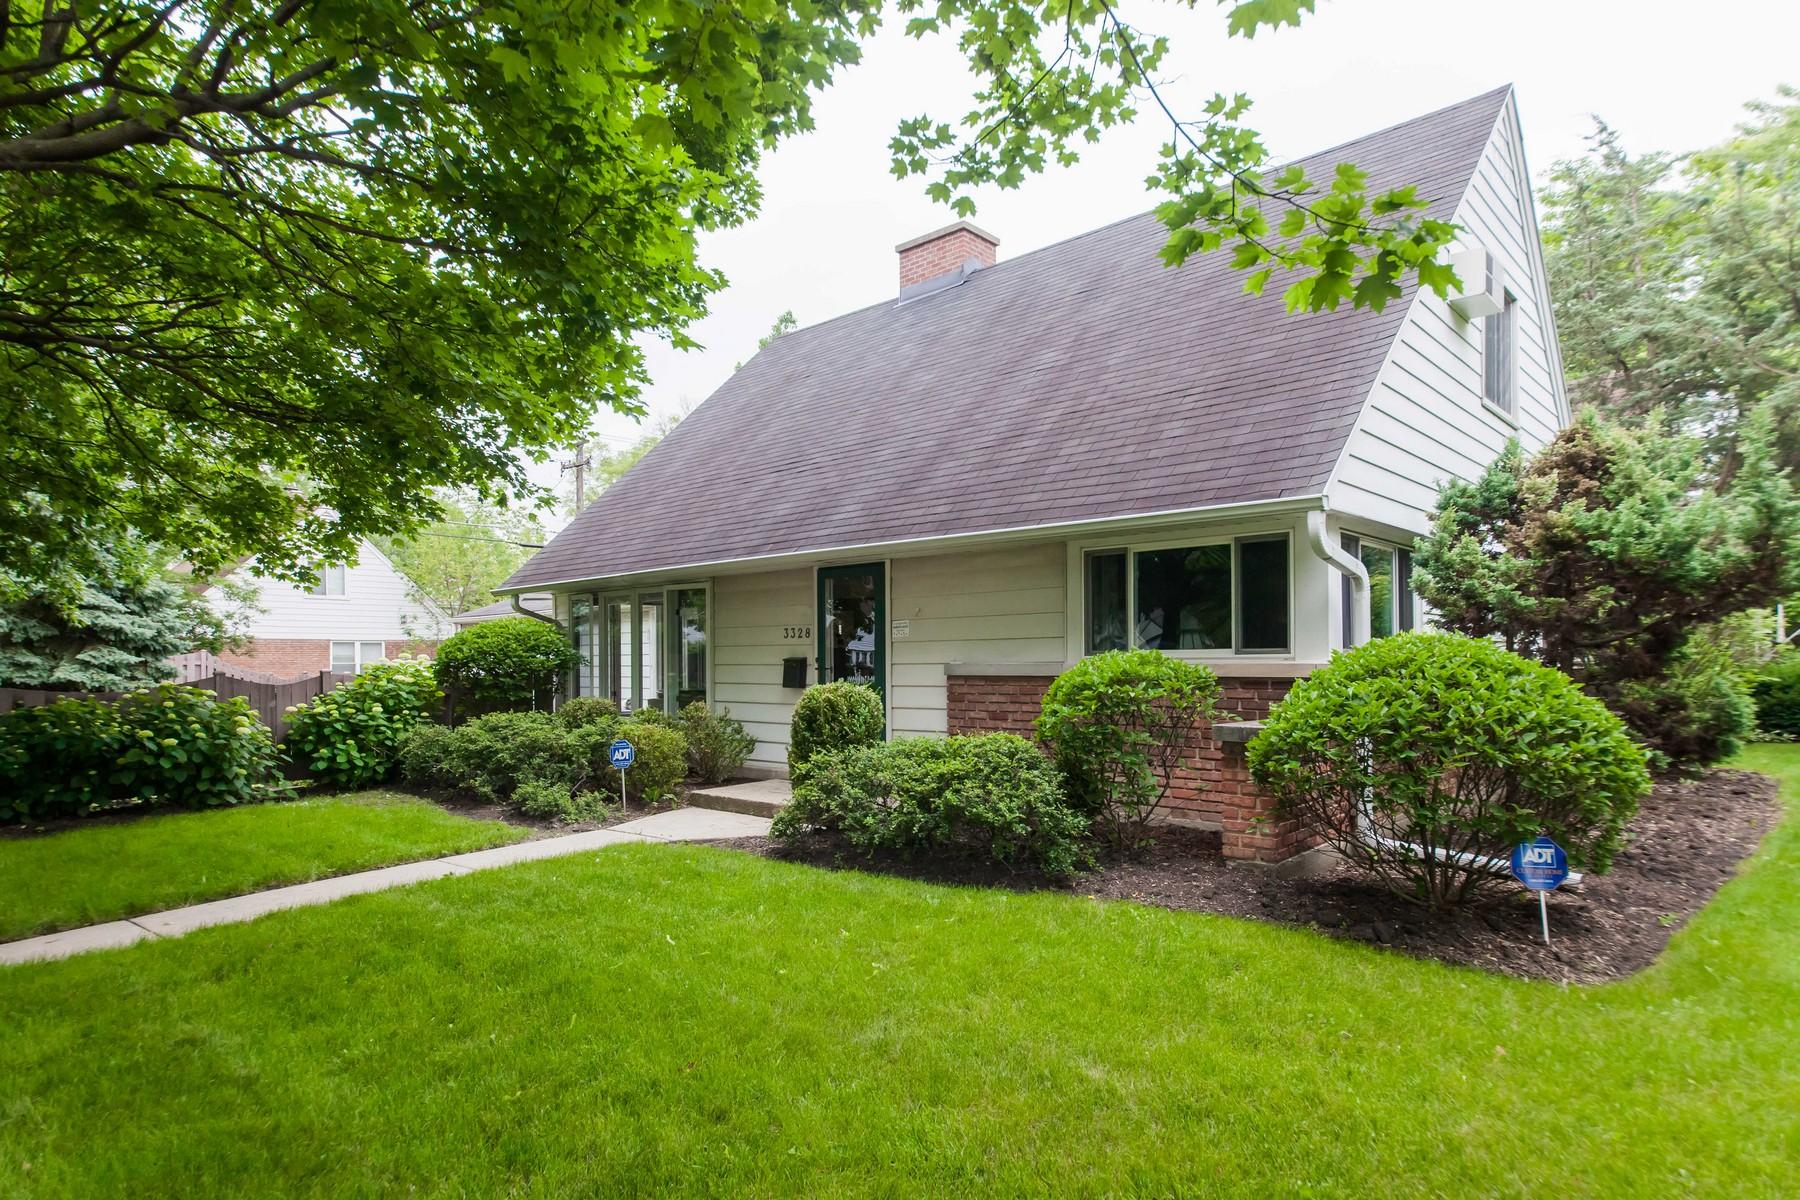 Casa para uma família para Venda às Move-In Ready Cape Cod With Great Floor Plan 3328 Noyes Street Evanston, Illinois, 60201 Estados Unidos